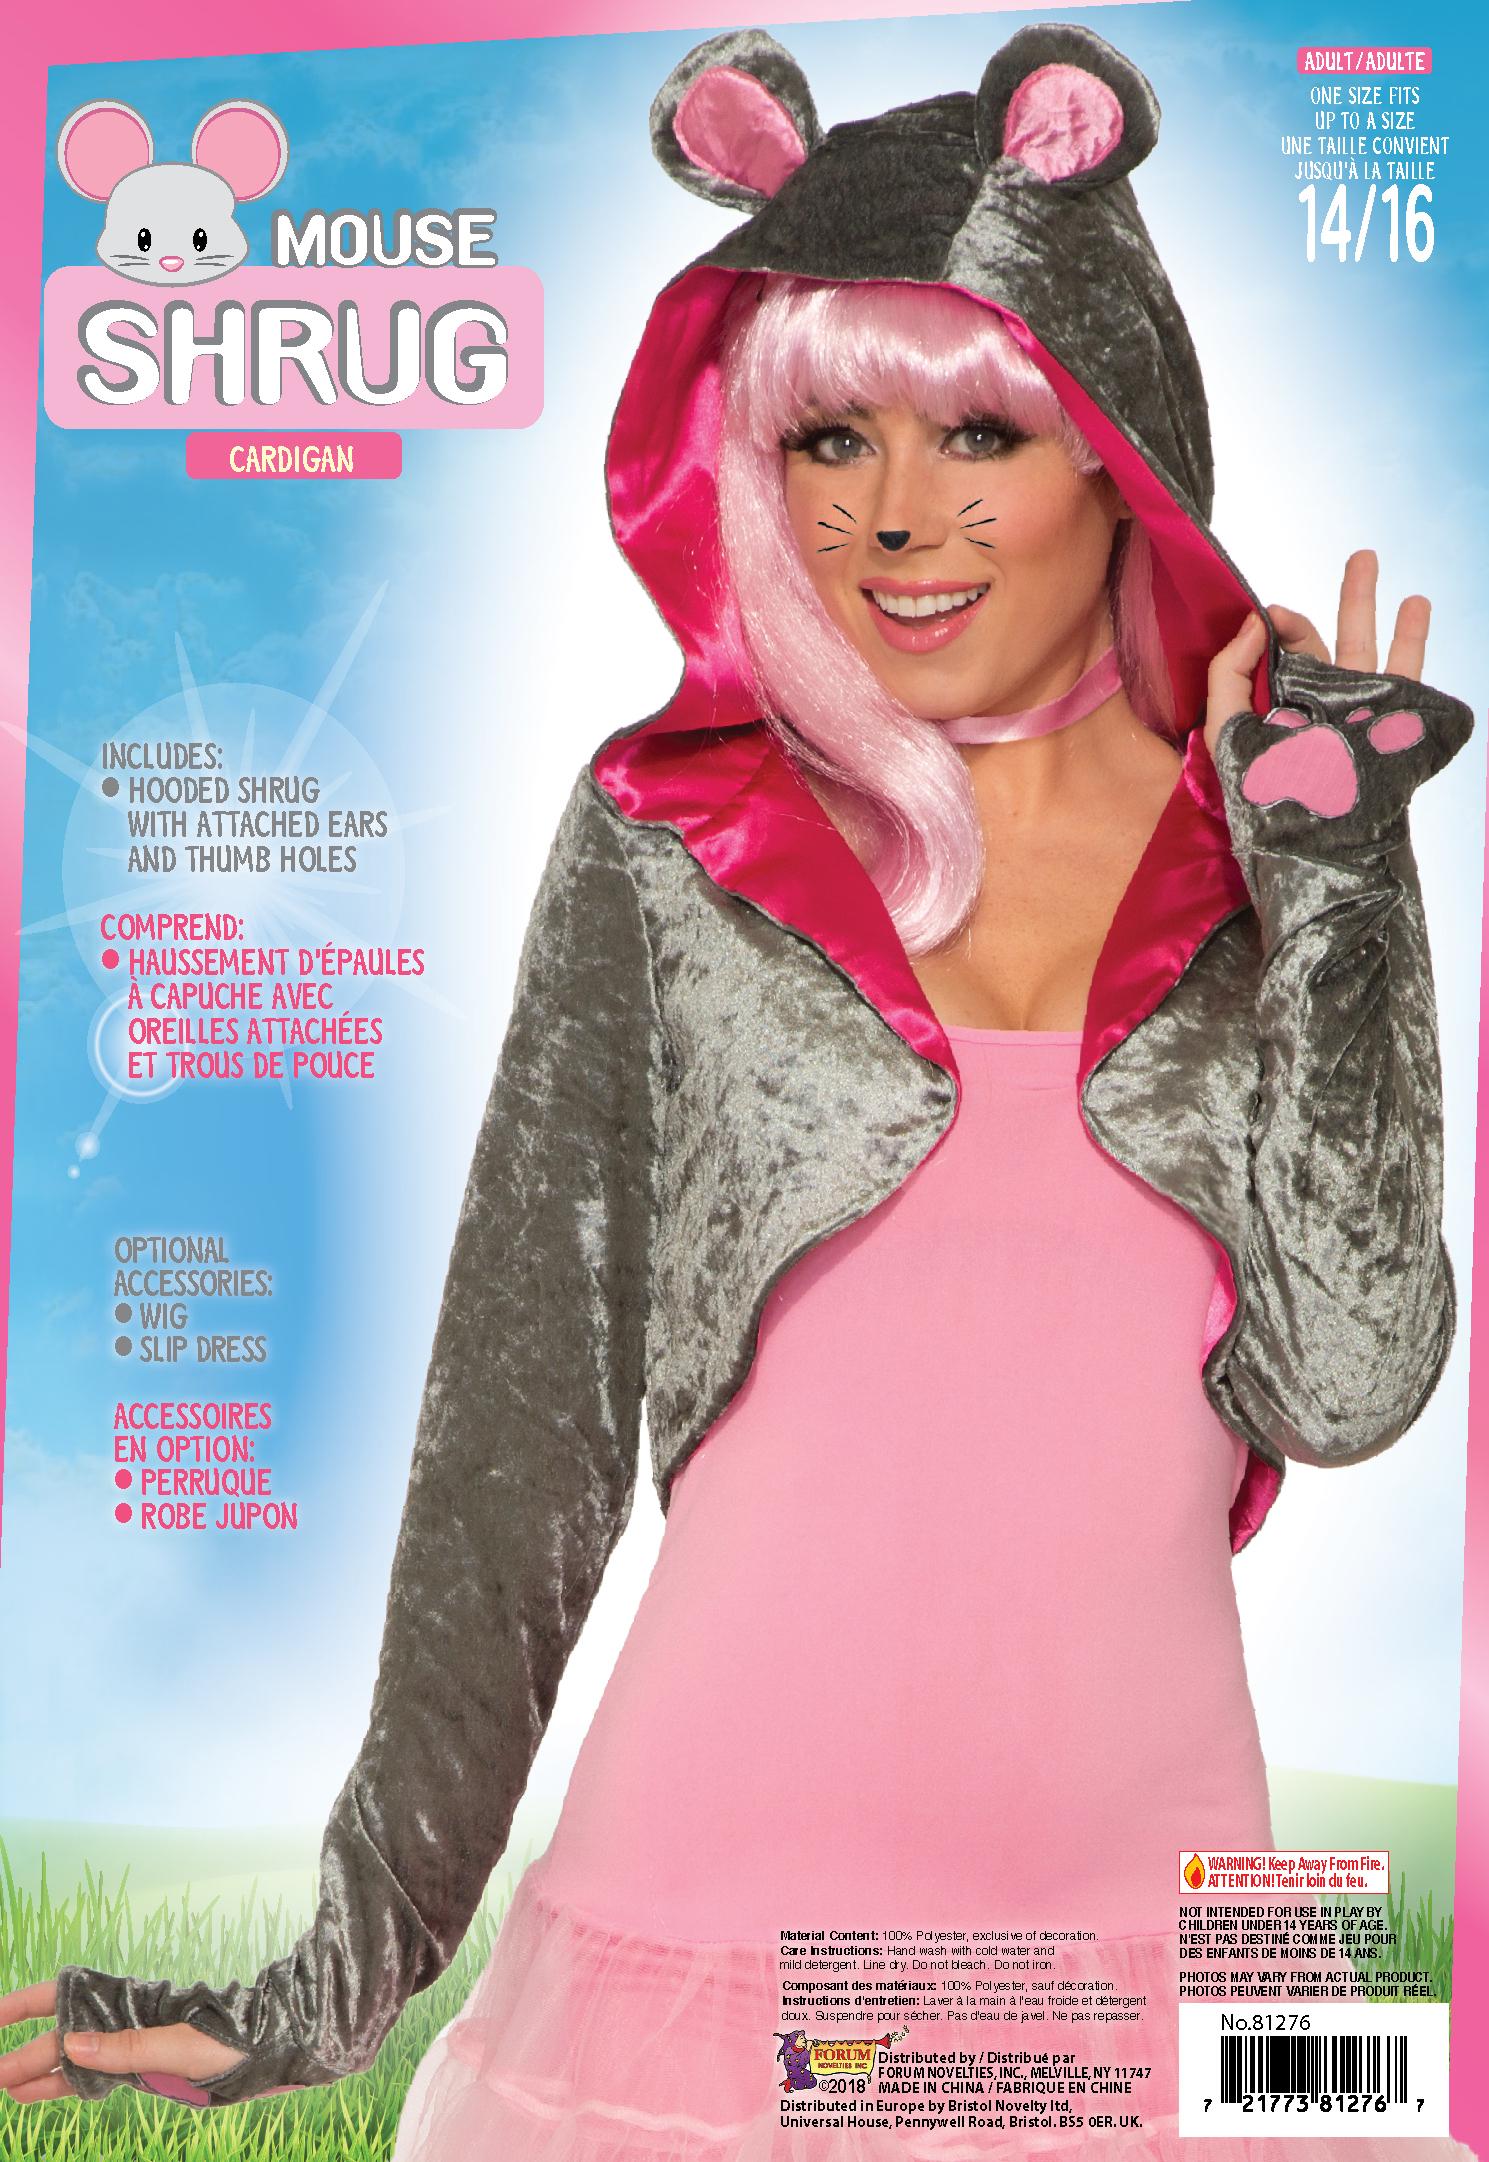 cc493c525a89 Costume Cards — Tara Sharp